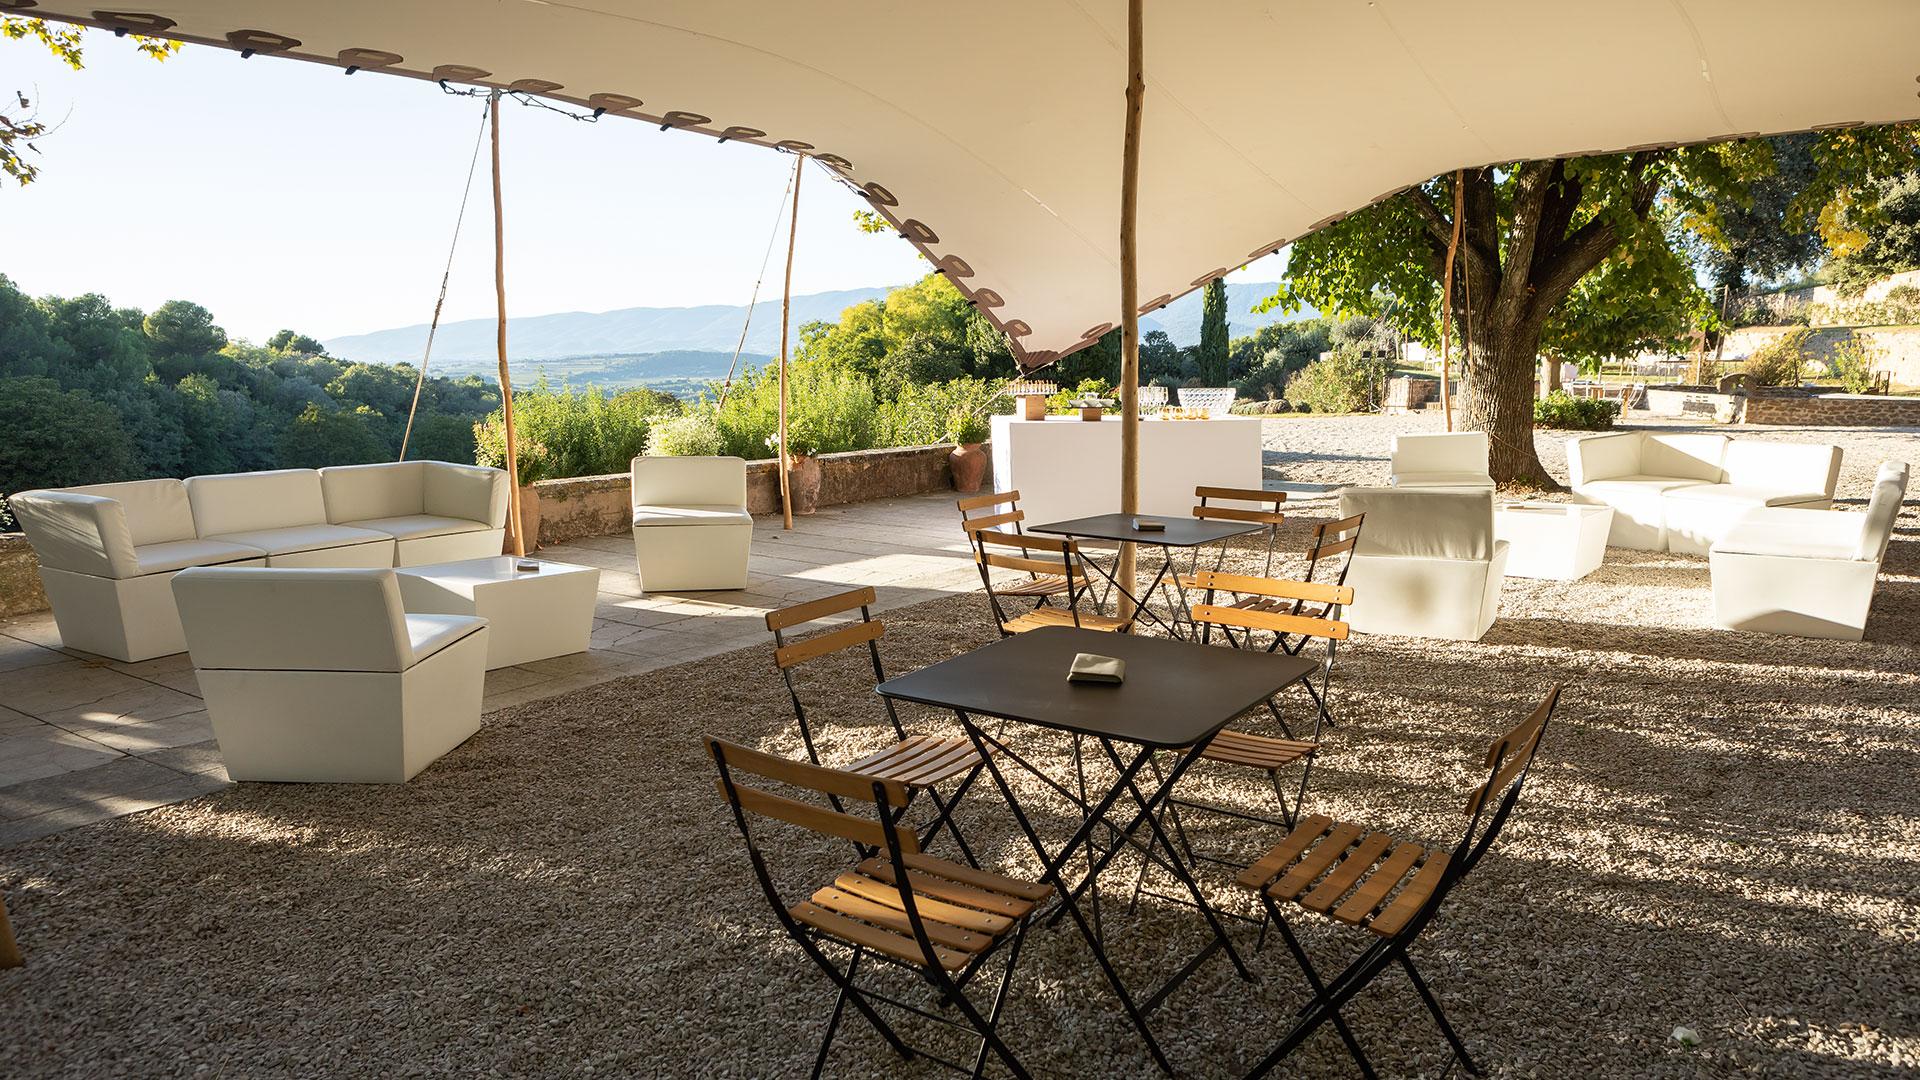 Bambou Tente Brasserie-Salon De Chapiteau-Salon De Jardin ... pour Salon De Jardin En Bambou